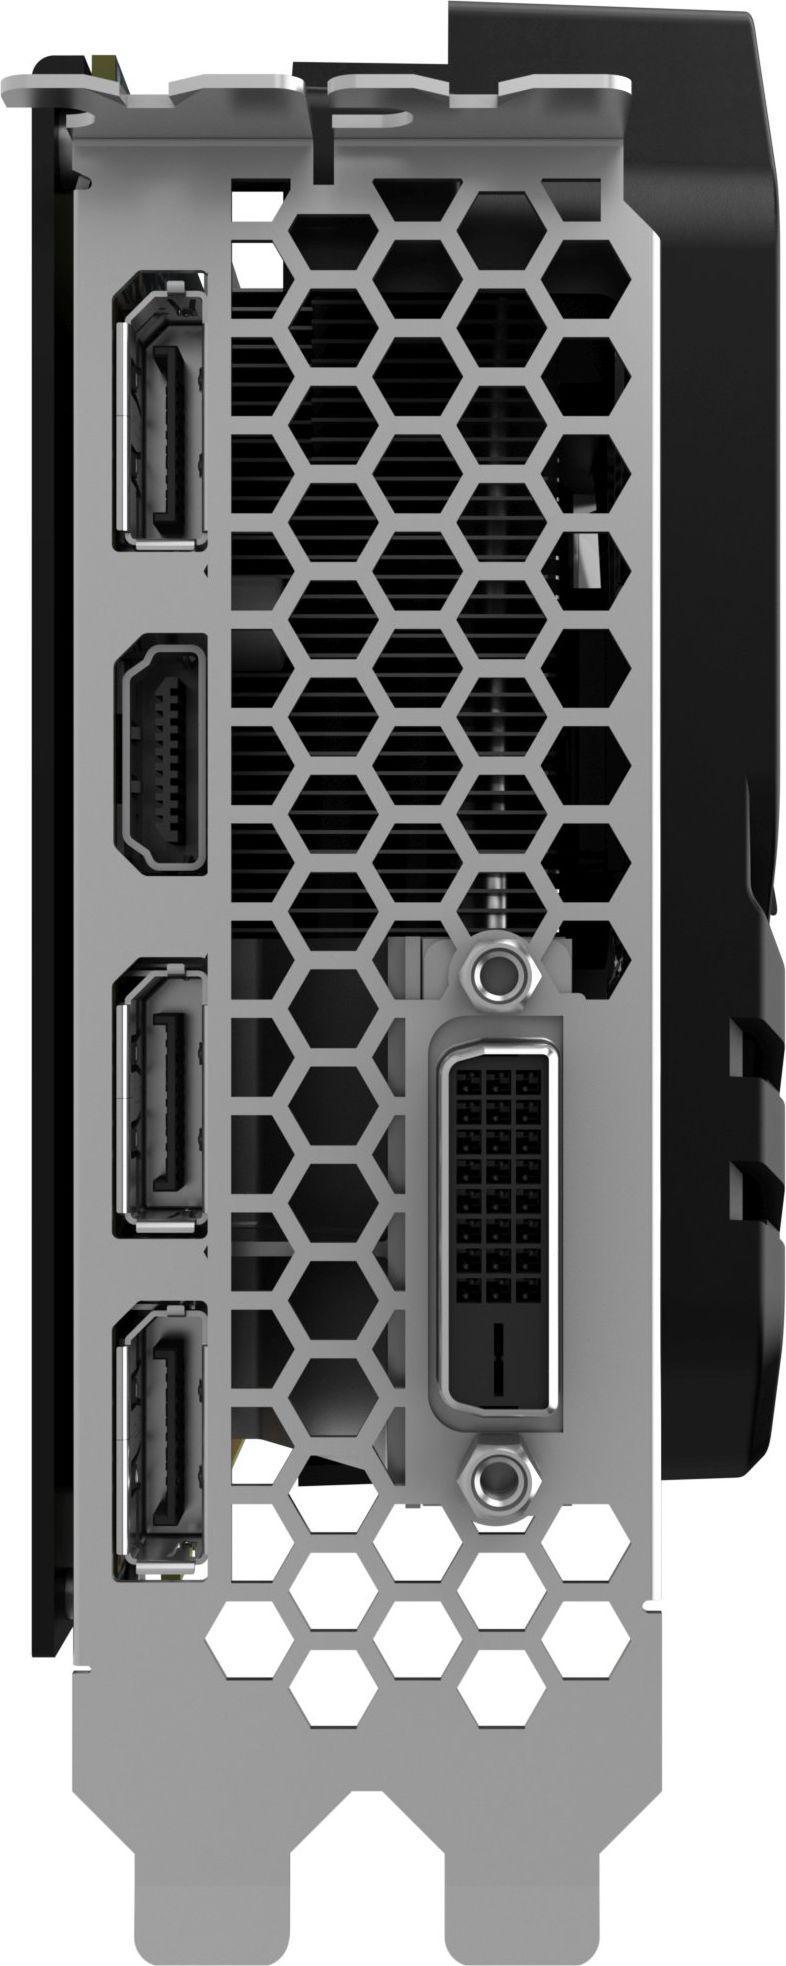 Palit GeForce GTX 1060 Super JetStream 6GB GDDR5 (192 bit) 3x DP,